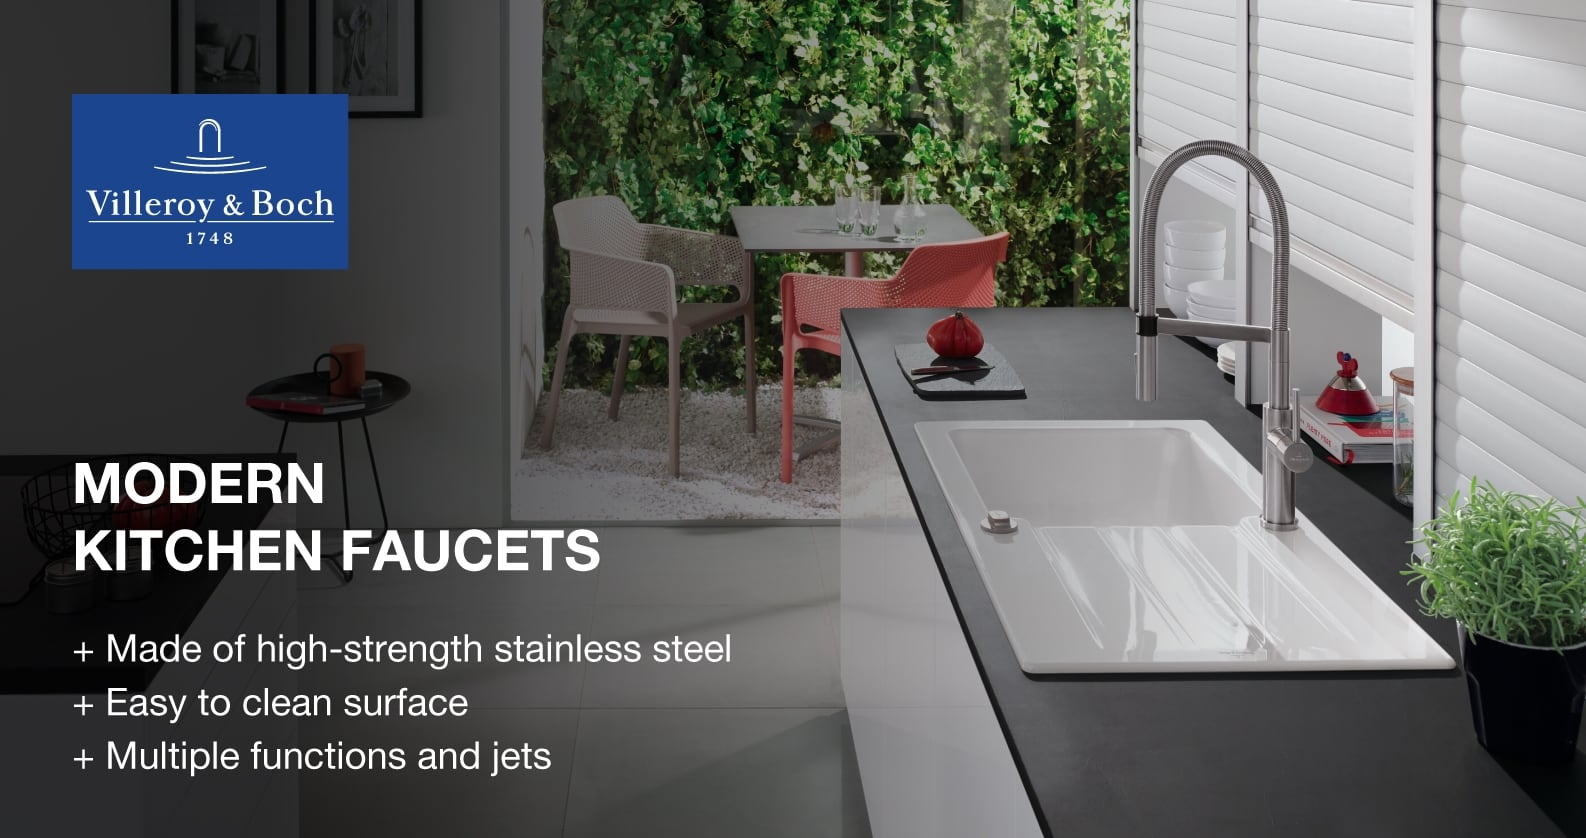 Villeroy & Boch kitchen faucets